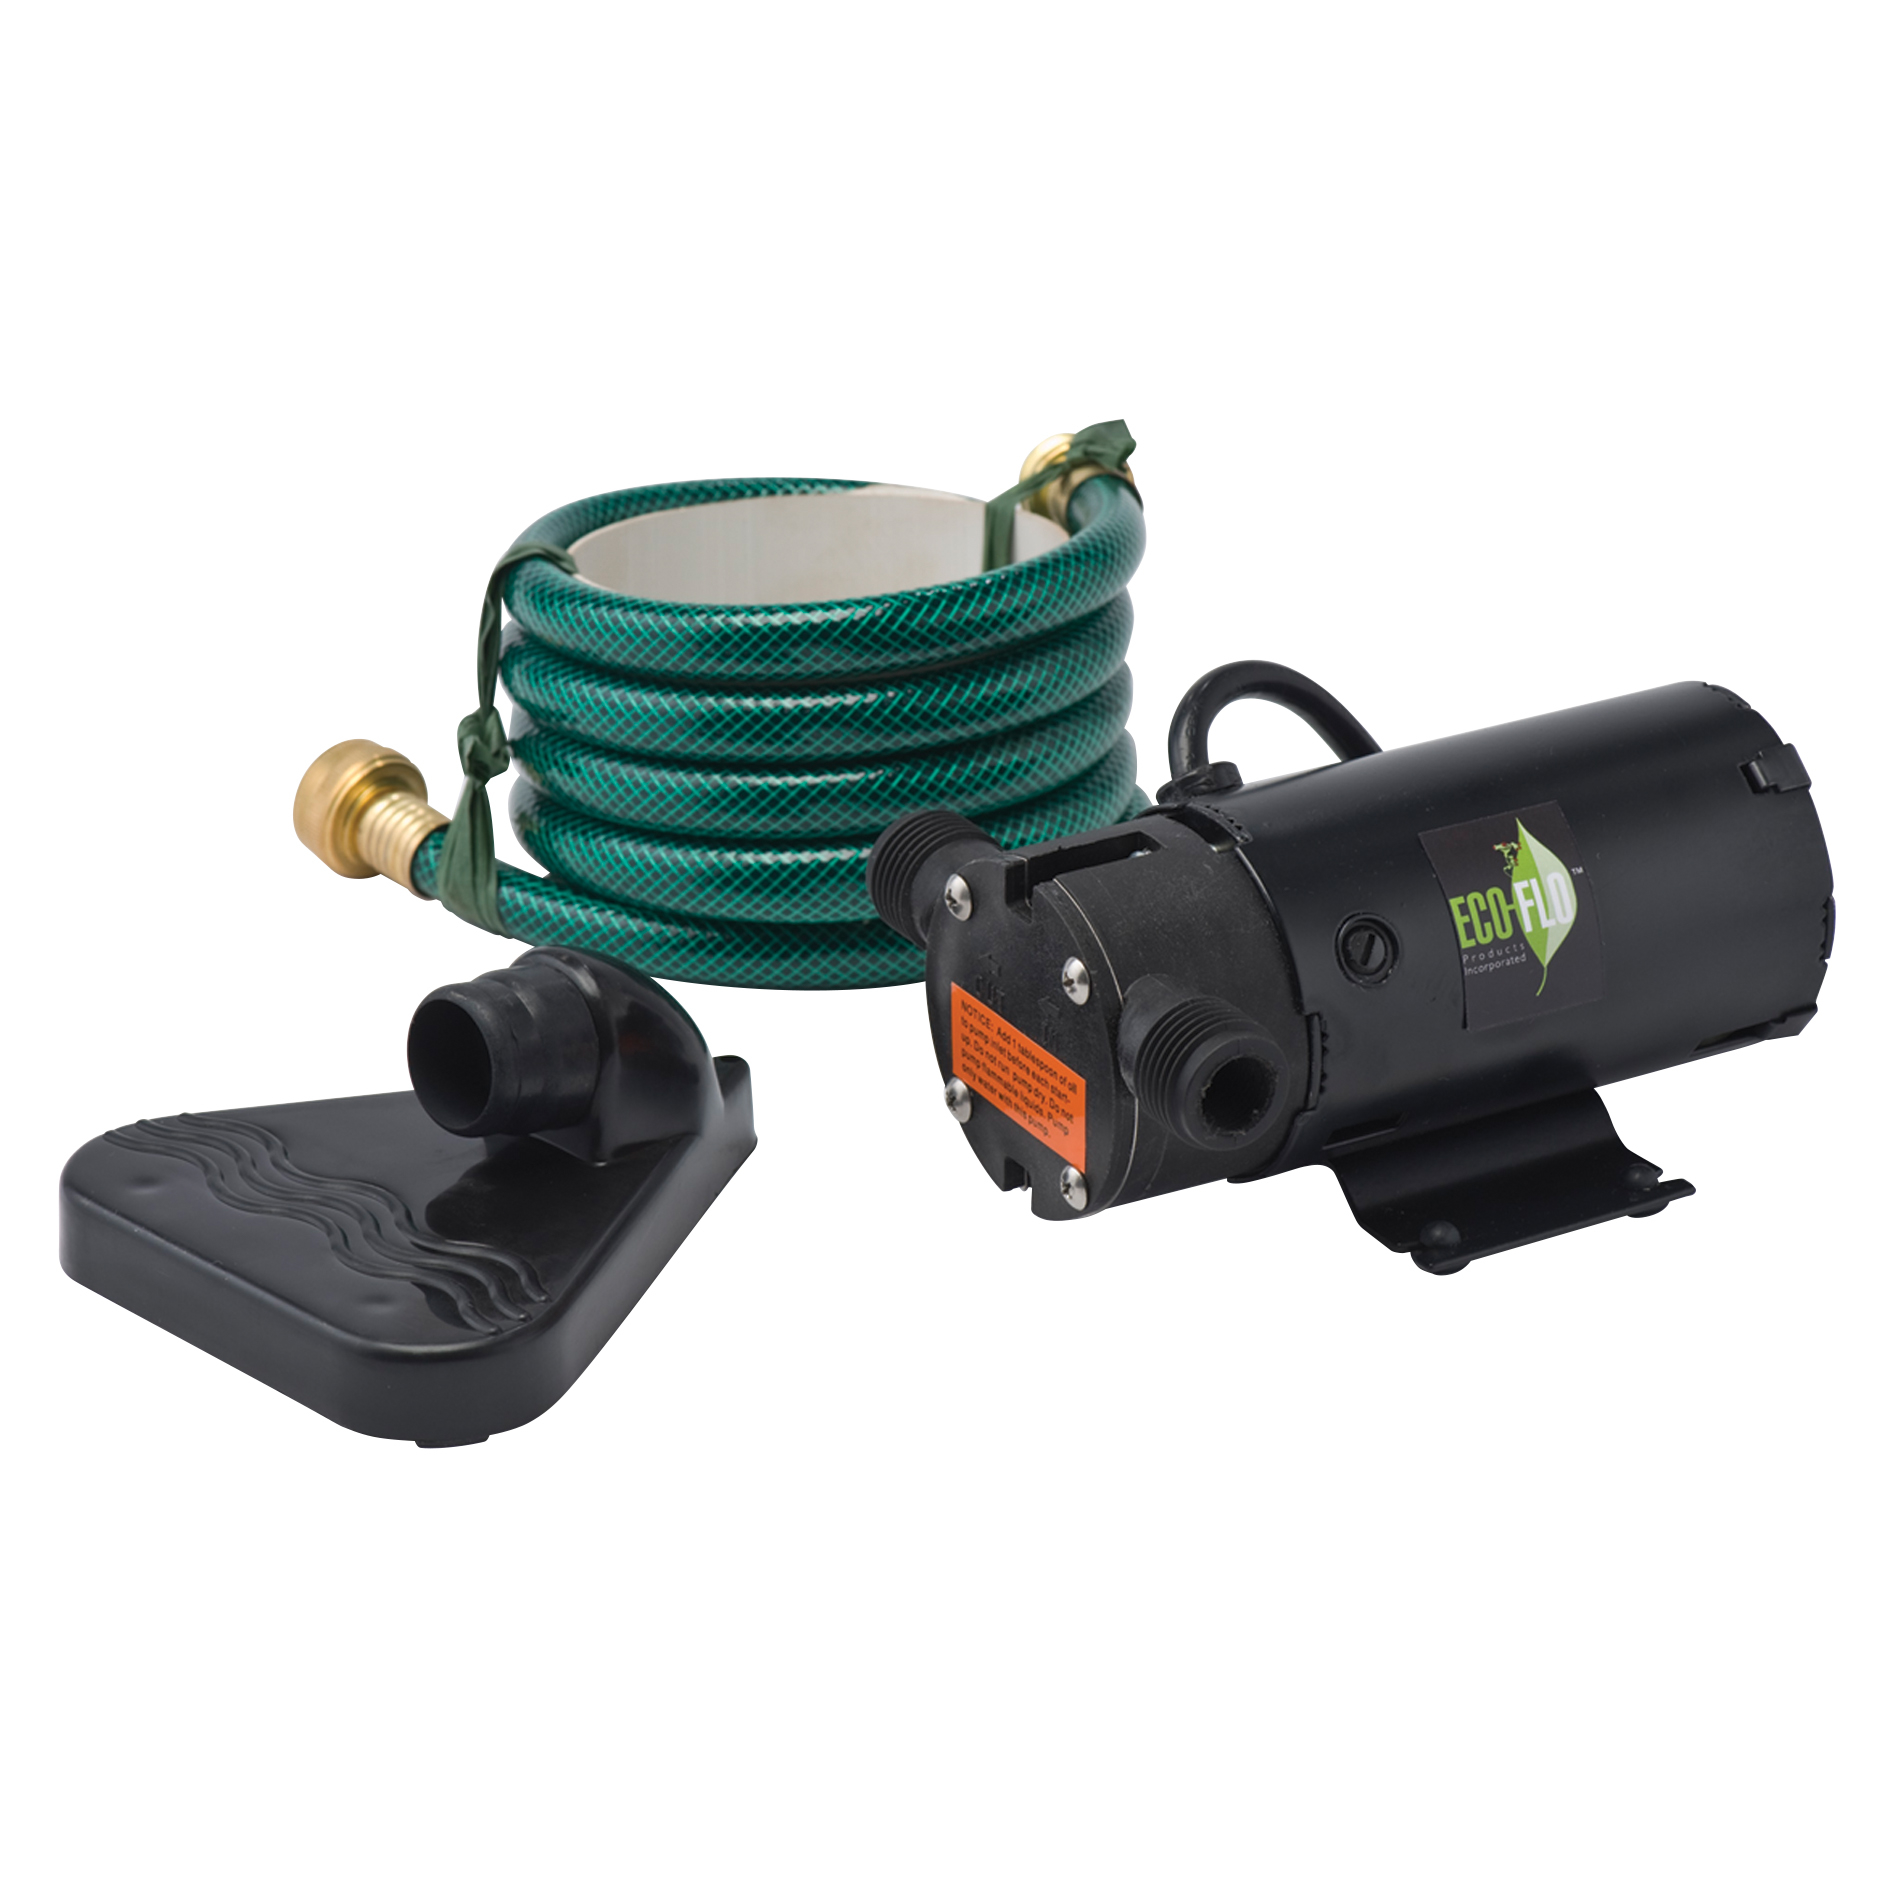 Eco Flo PUP61 115 Volt Lightweight Utility Pump